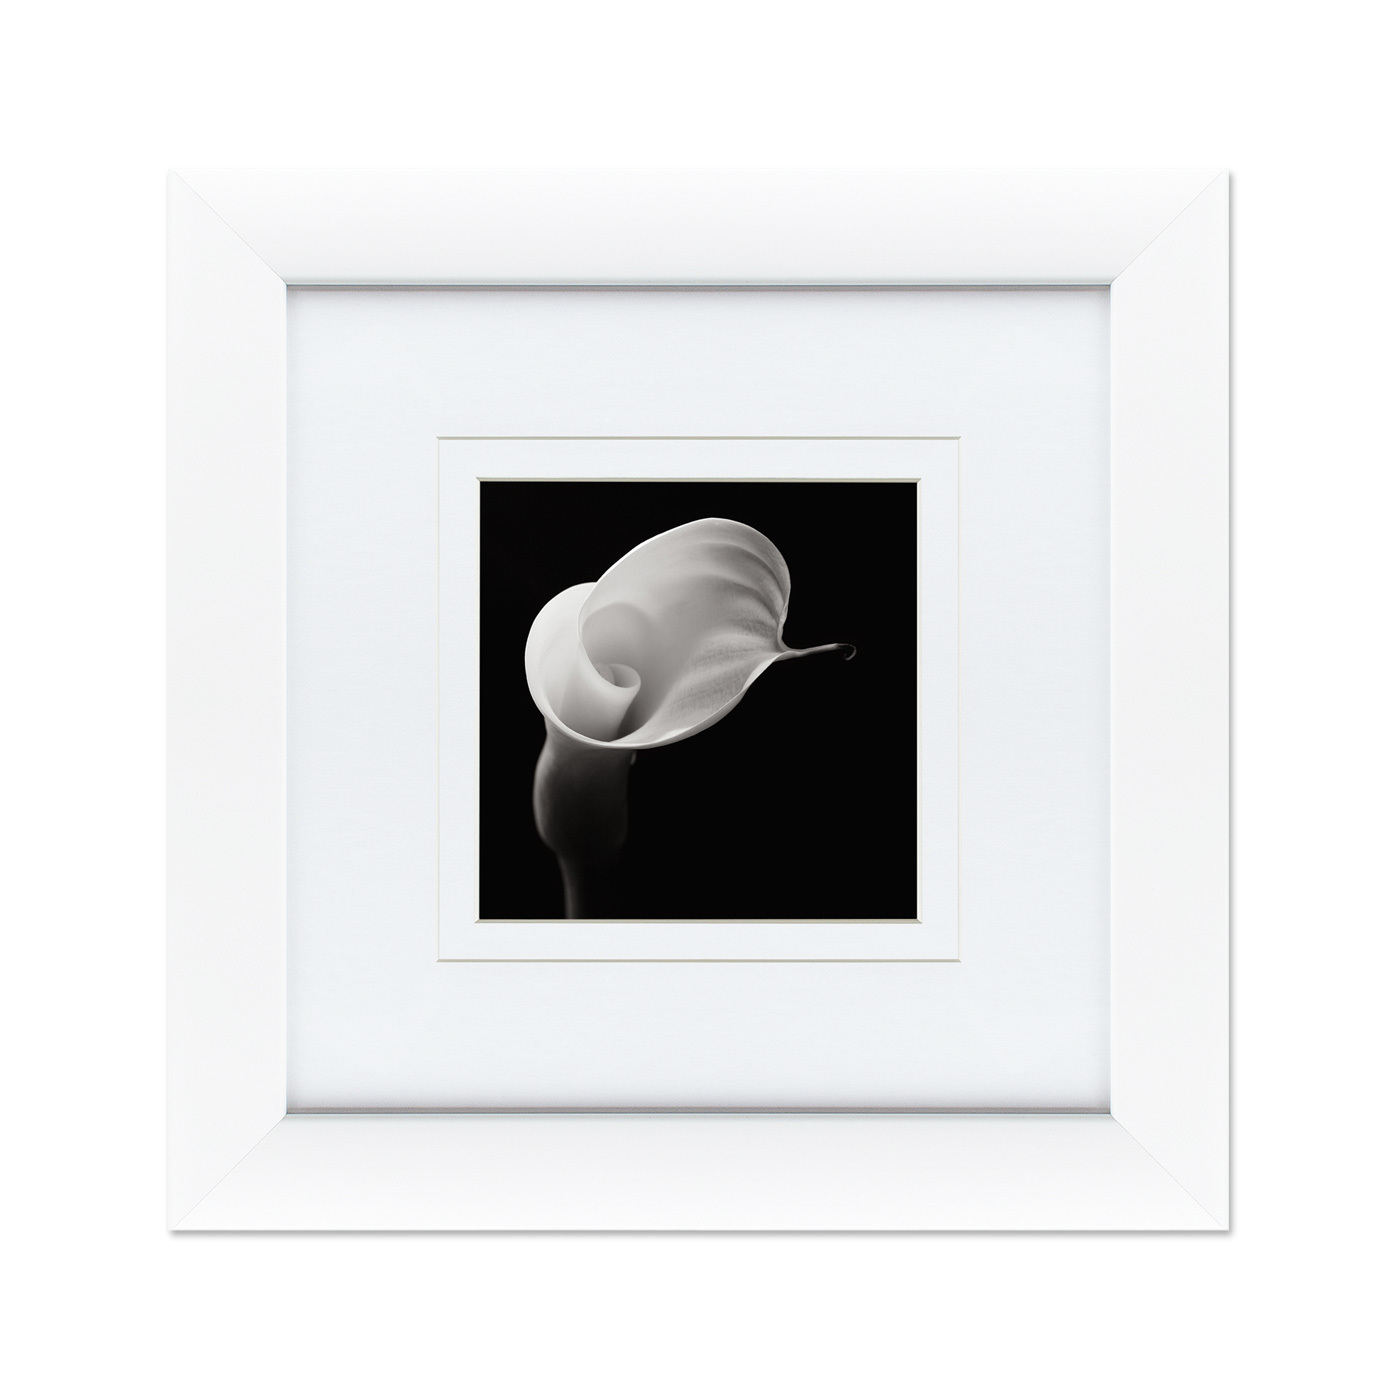 {} Картины в Квартиру Картина Каллы №3 (35х35 см) картины в квартиру картина каллы 2 35х35 см